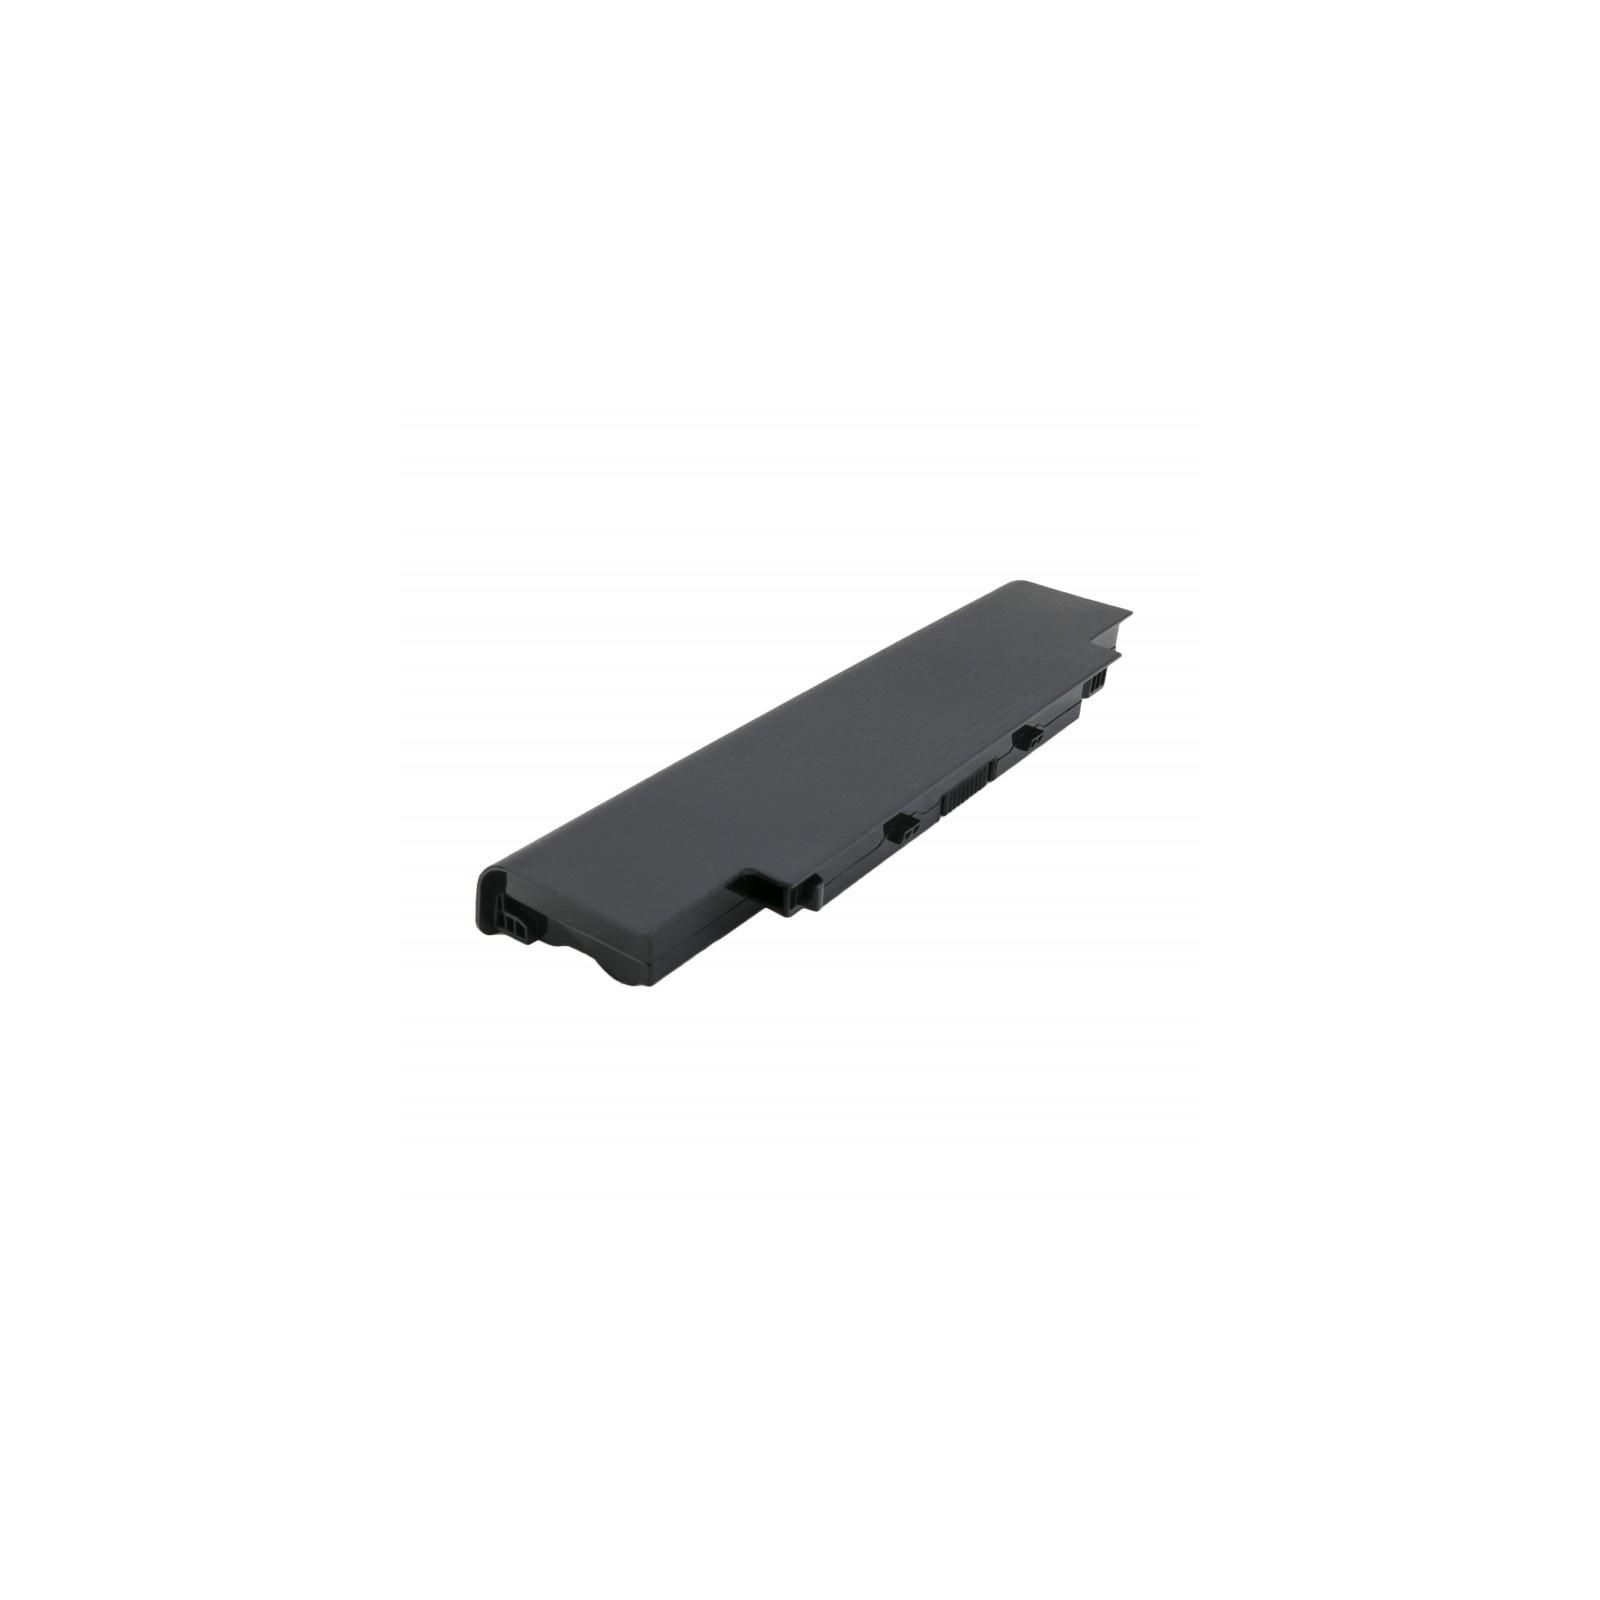 Аккумулятор для ноутбука Dell Inspiron N4010, 5200mAh EXTRADIGITAL (BND3934) изображение 3